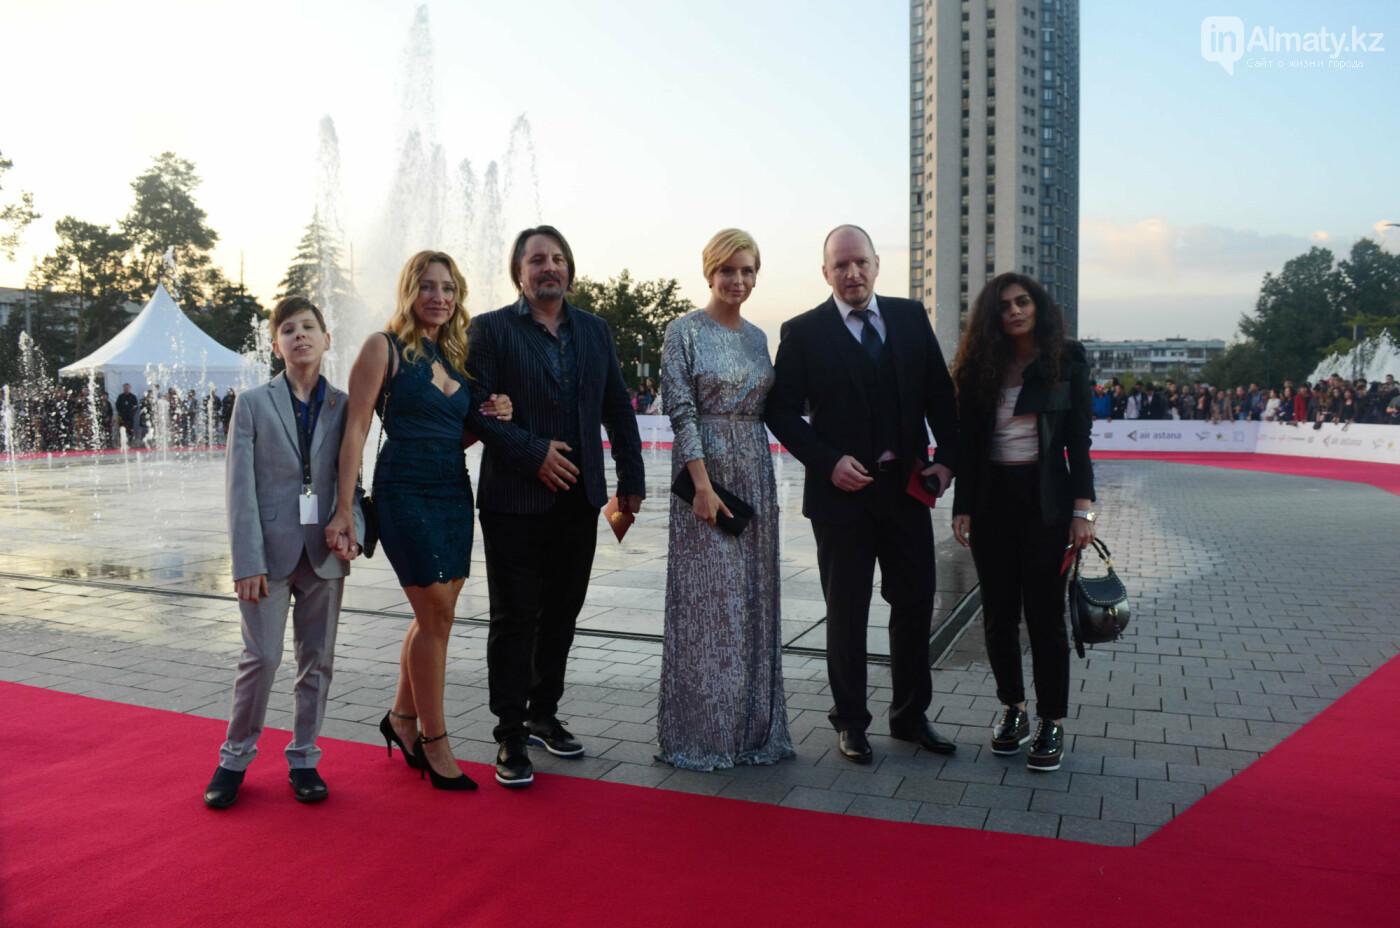 Второй Almaty Film Festival открылся фильмом «Тайна печати дракона» (фото), фото-6